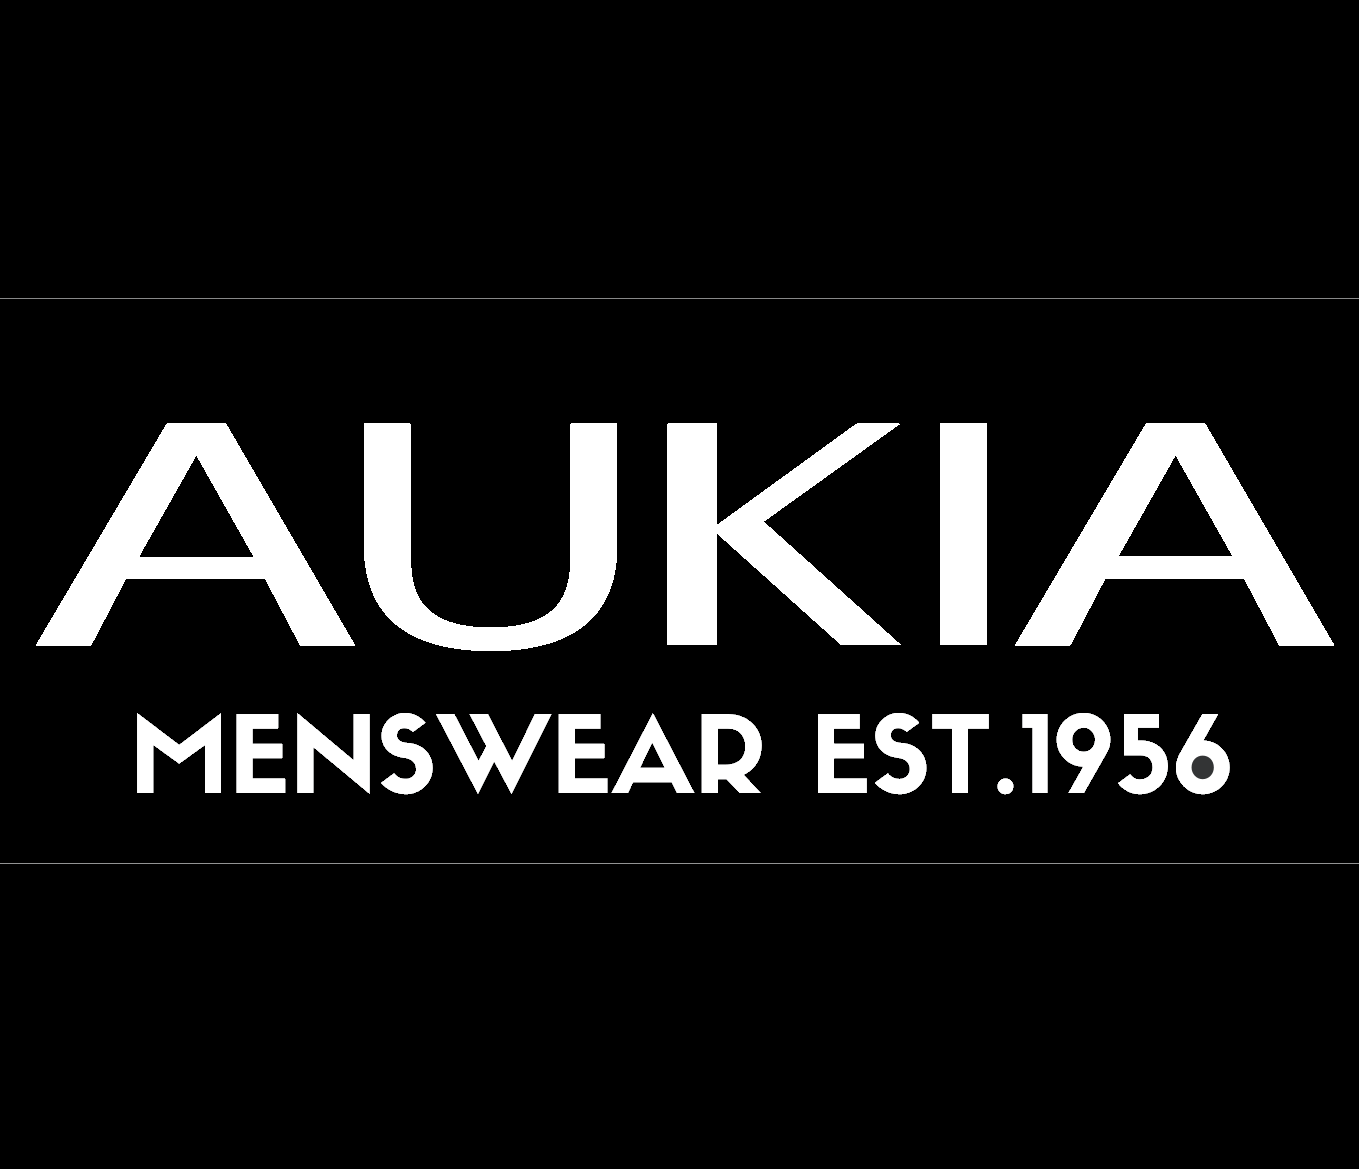 Aukia Menswear